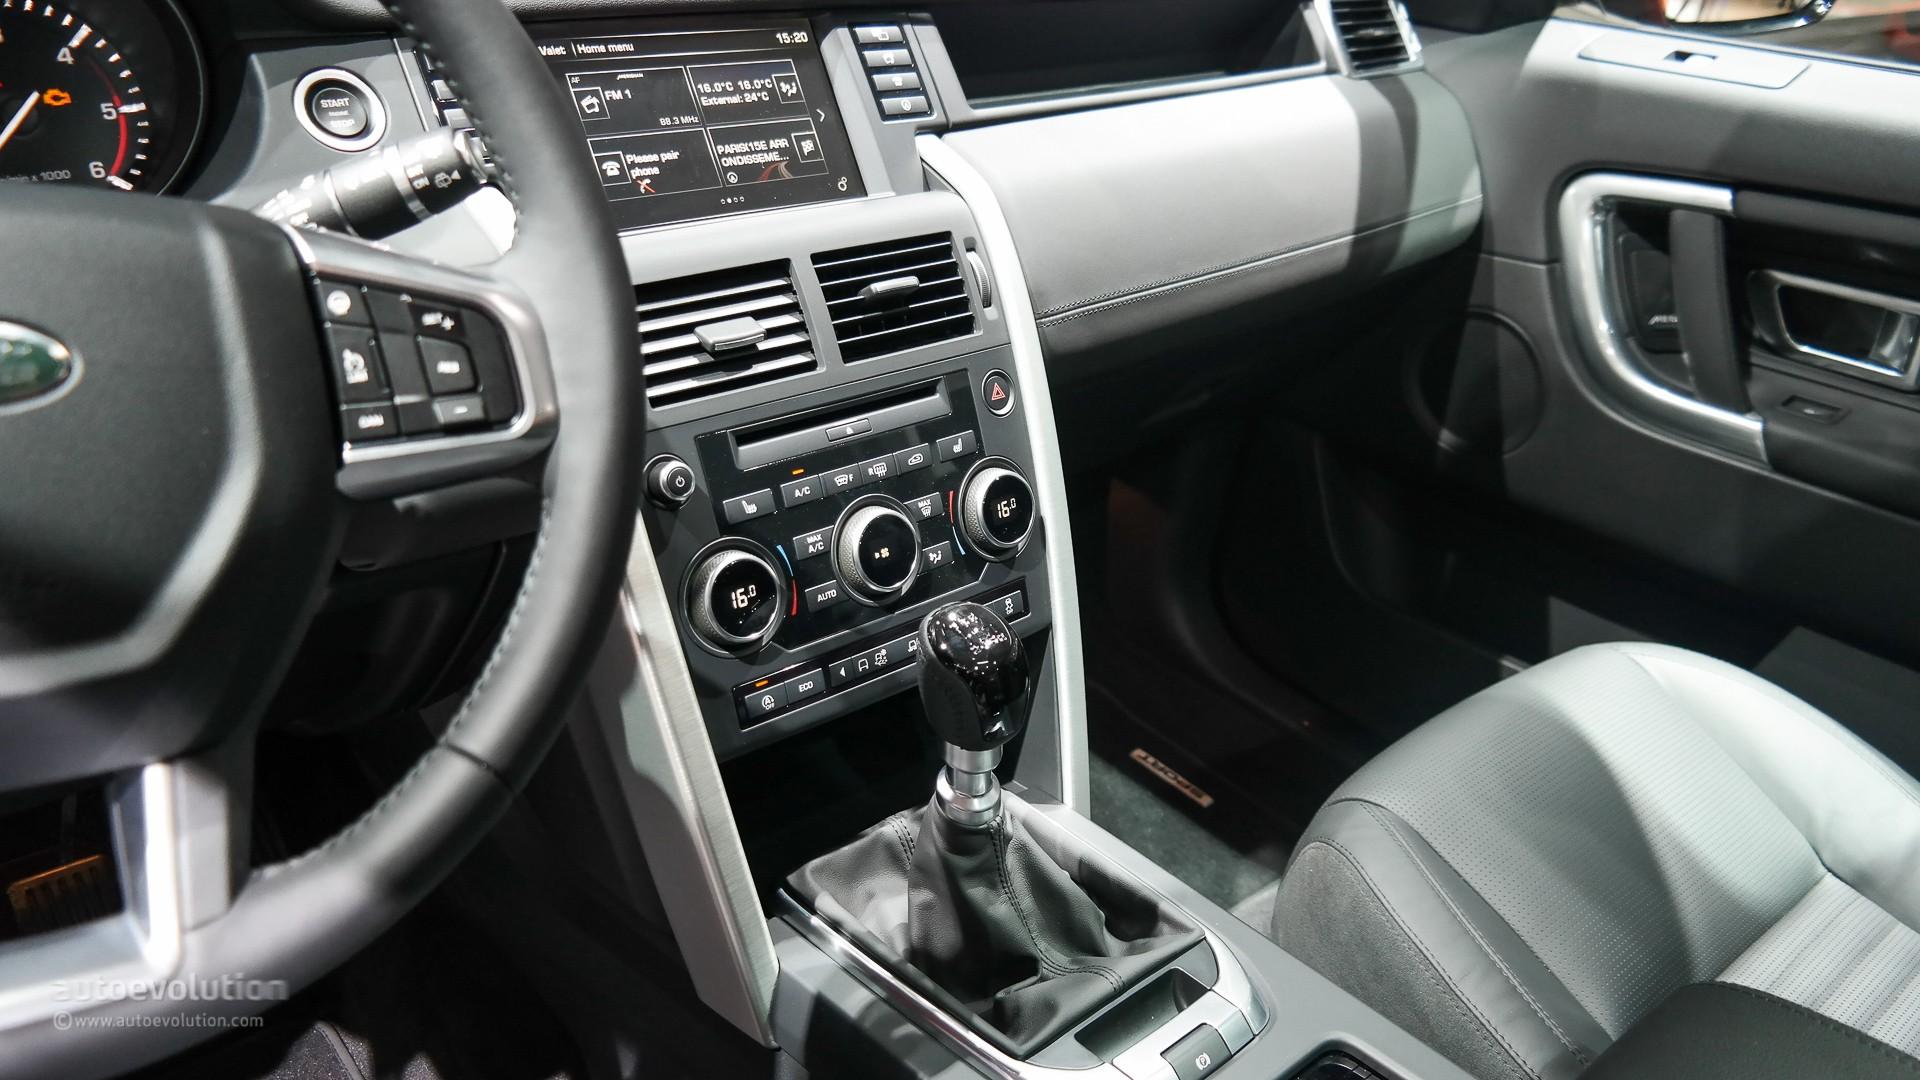 2015 land rover discovery sport makes us debut at la auto show rh autoevolution com range rover sport 2014 user manual range rover sport 2014 user manual